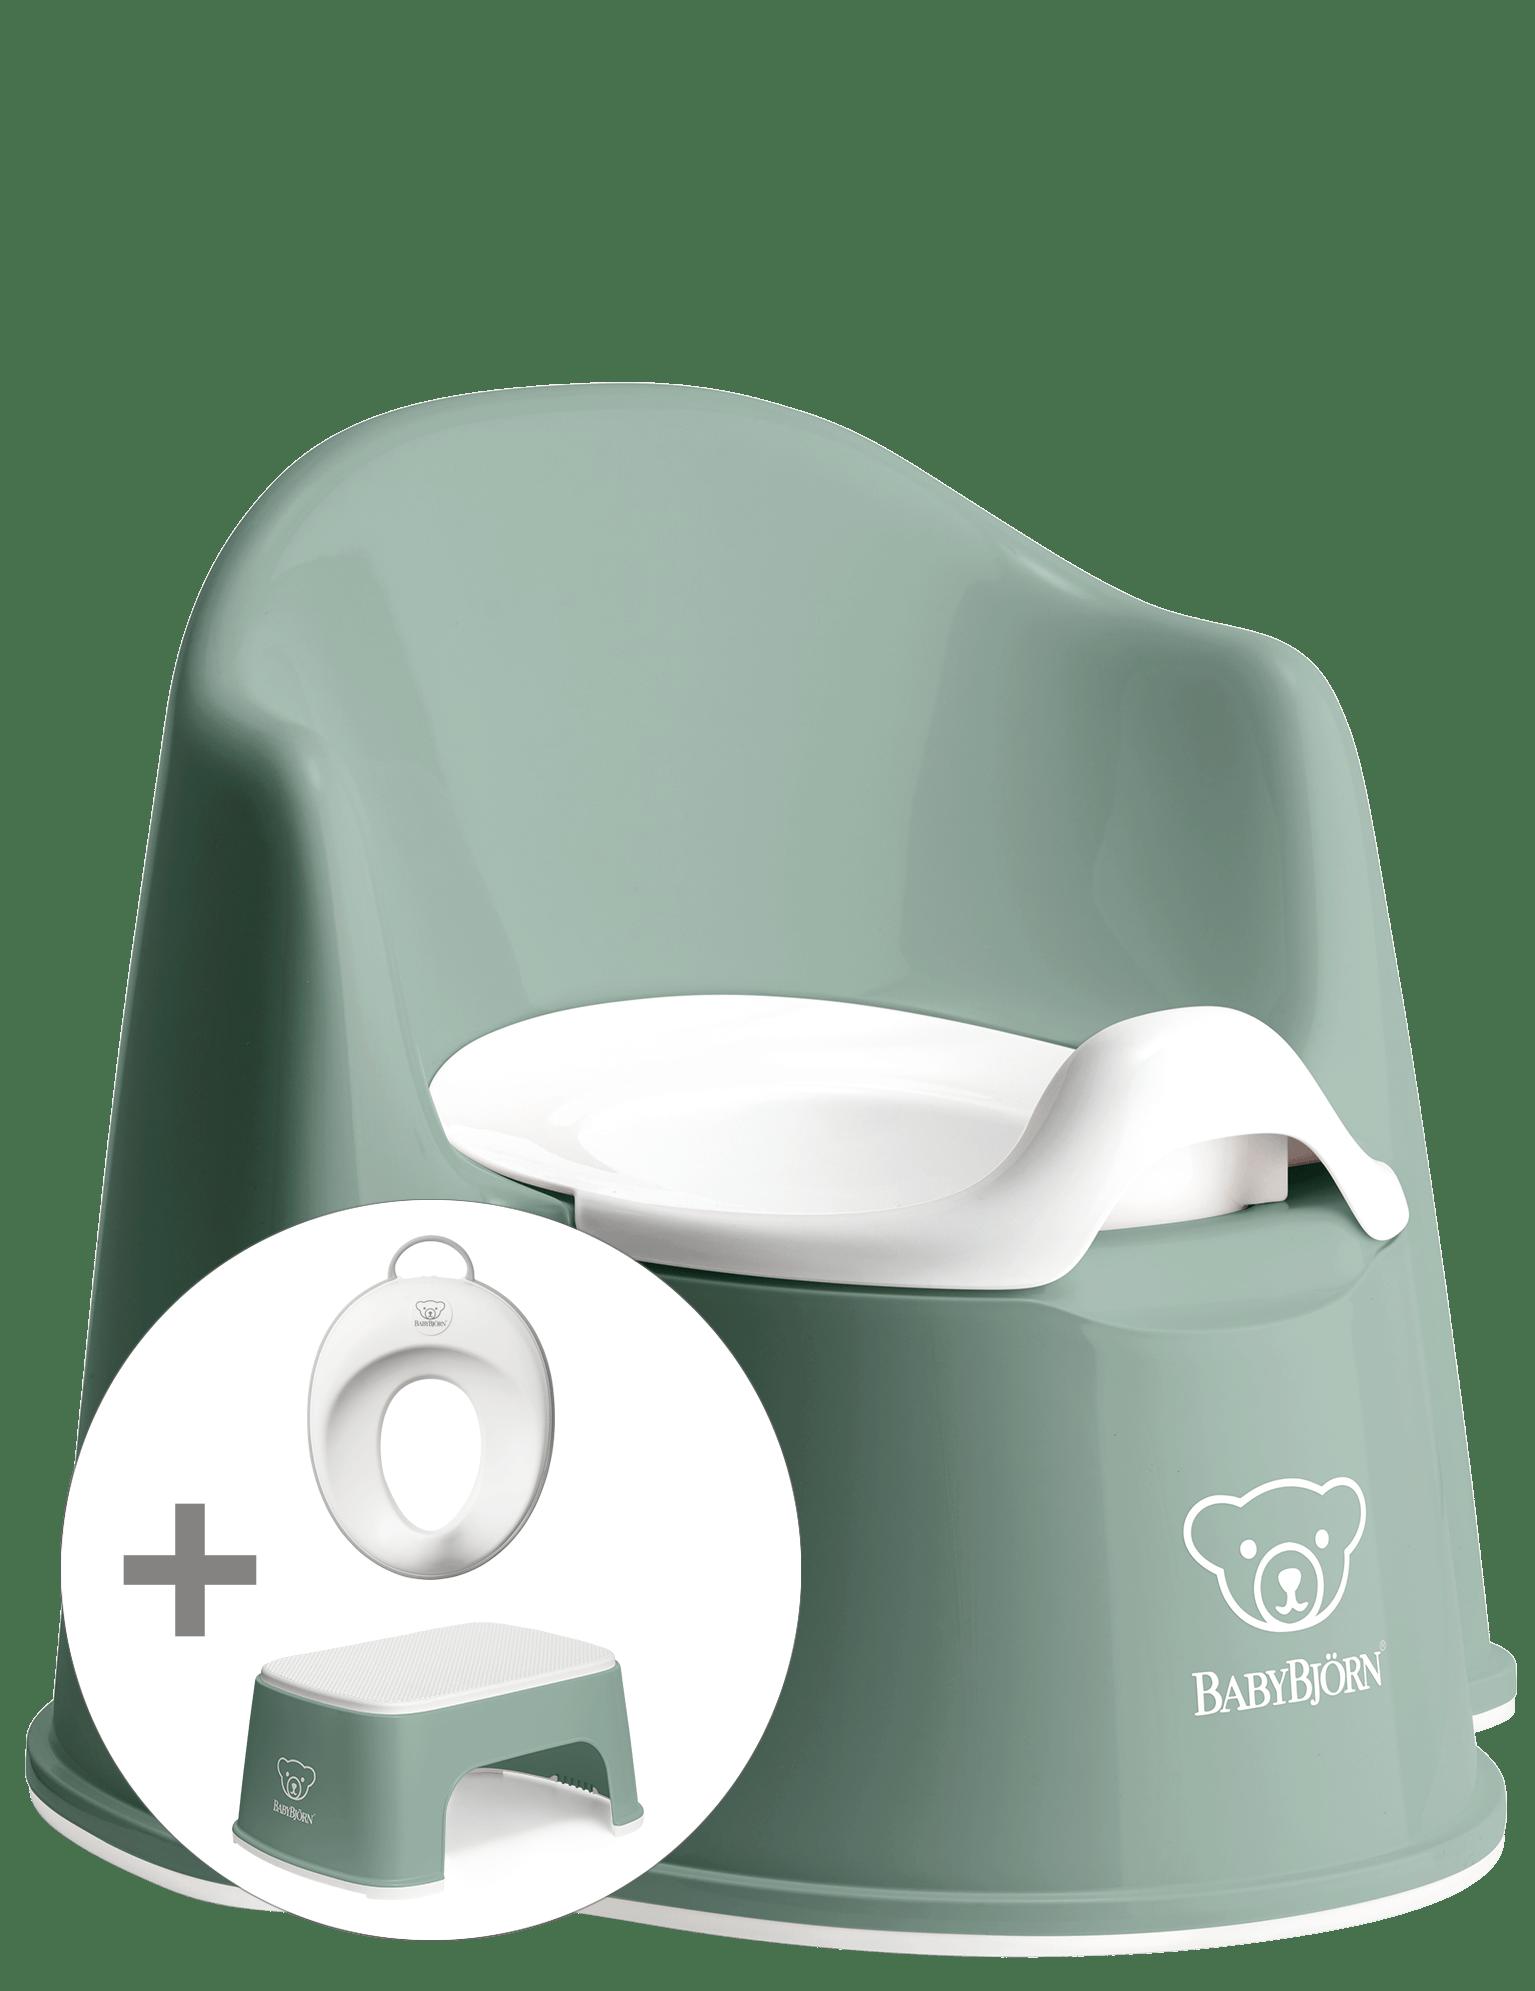 BABYBJÖRN Töpfchentraining Startpaket - Graugrün/Weiß